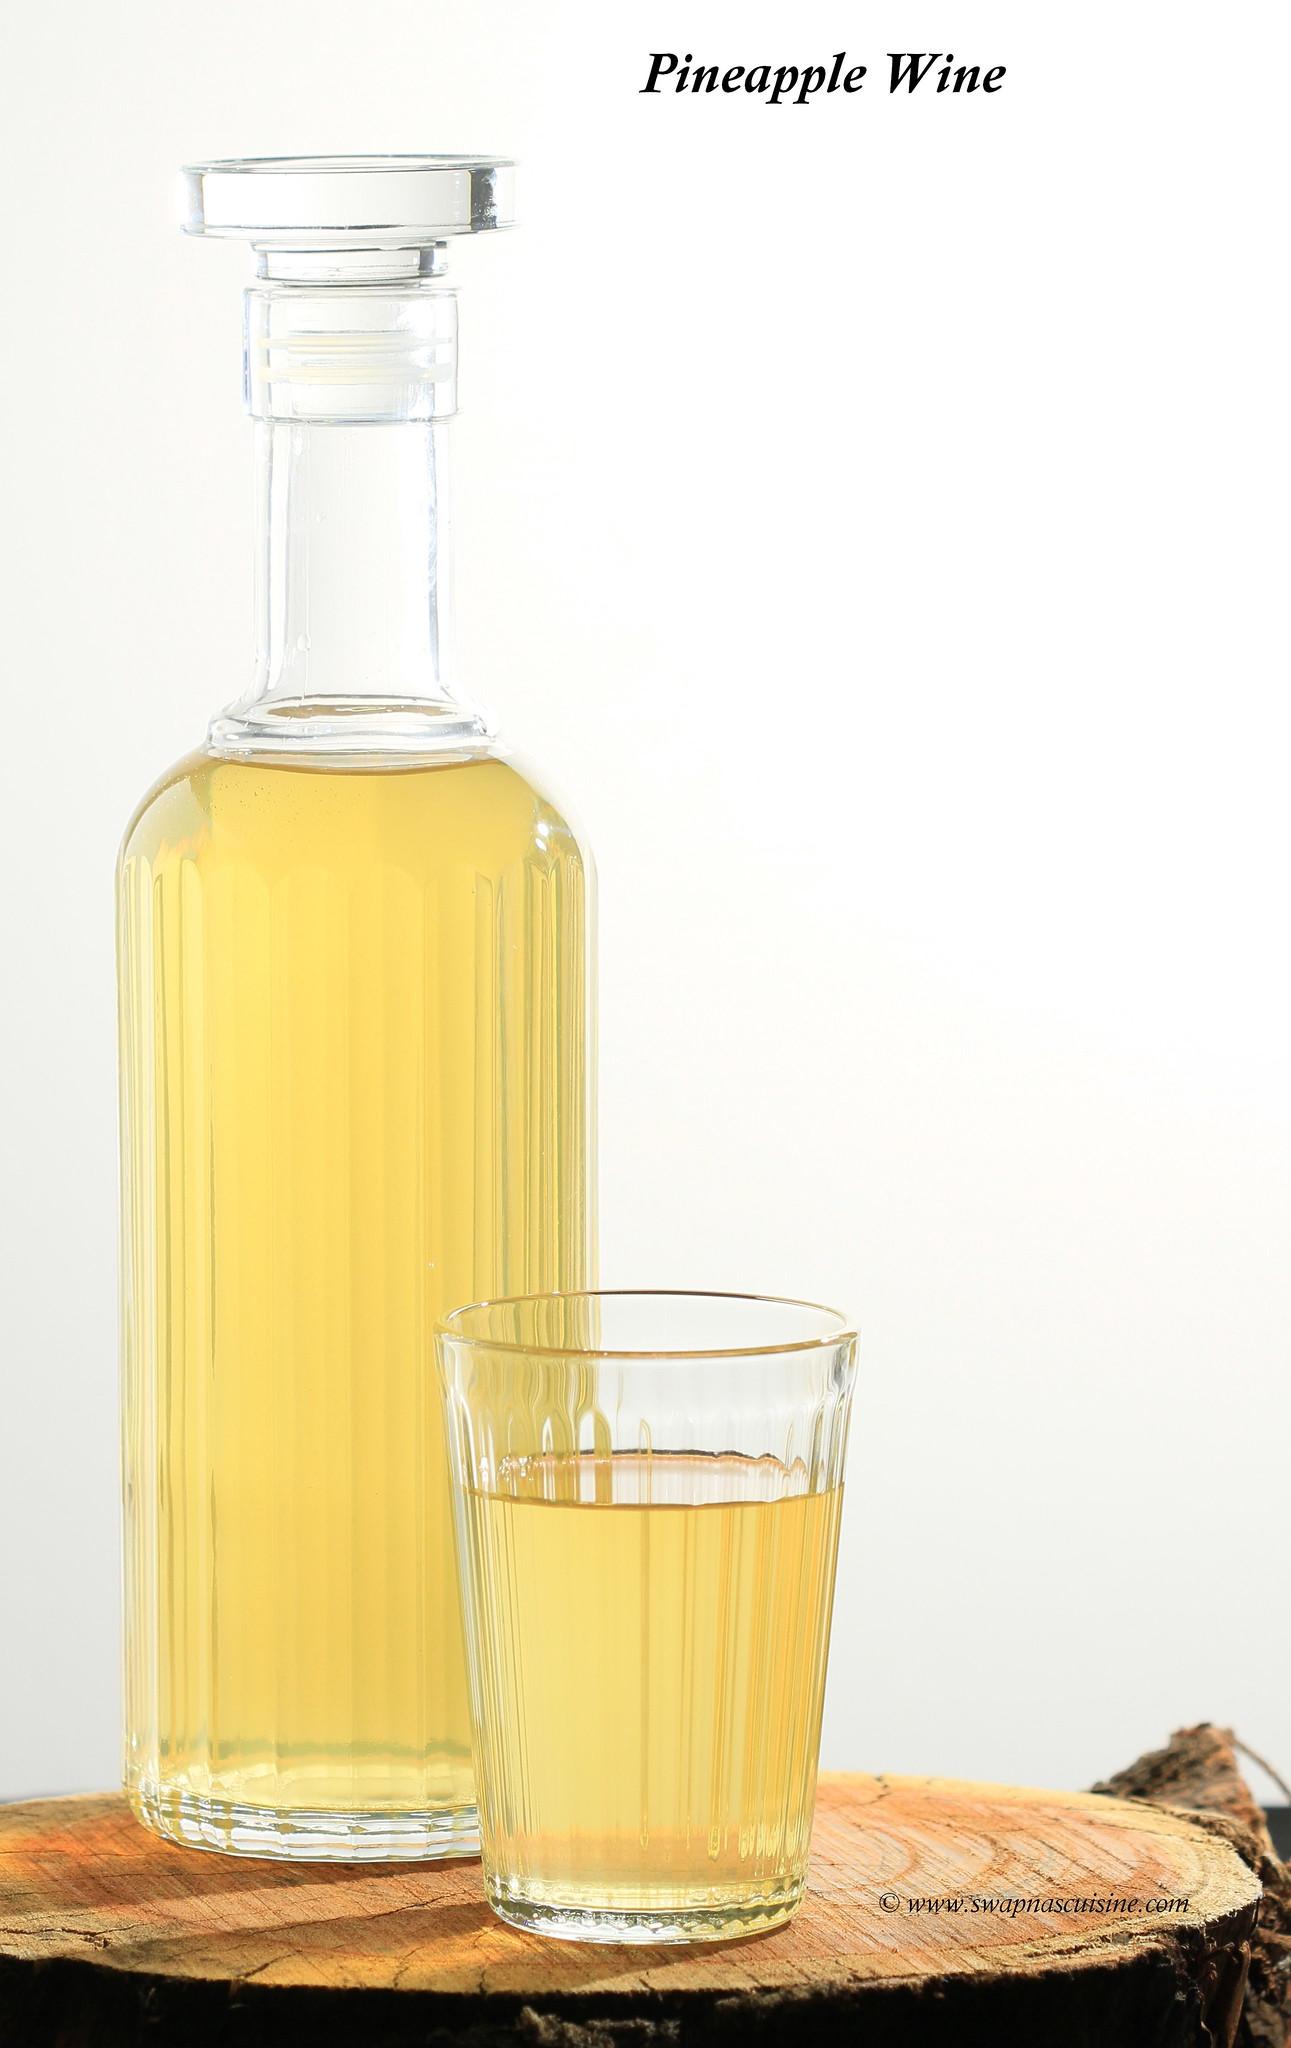 How to make Pineapple Wine